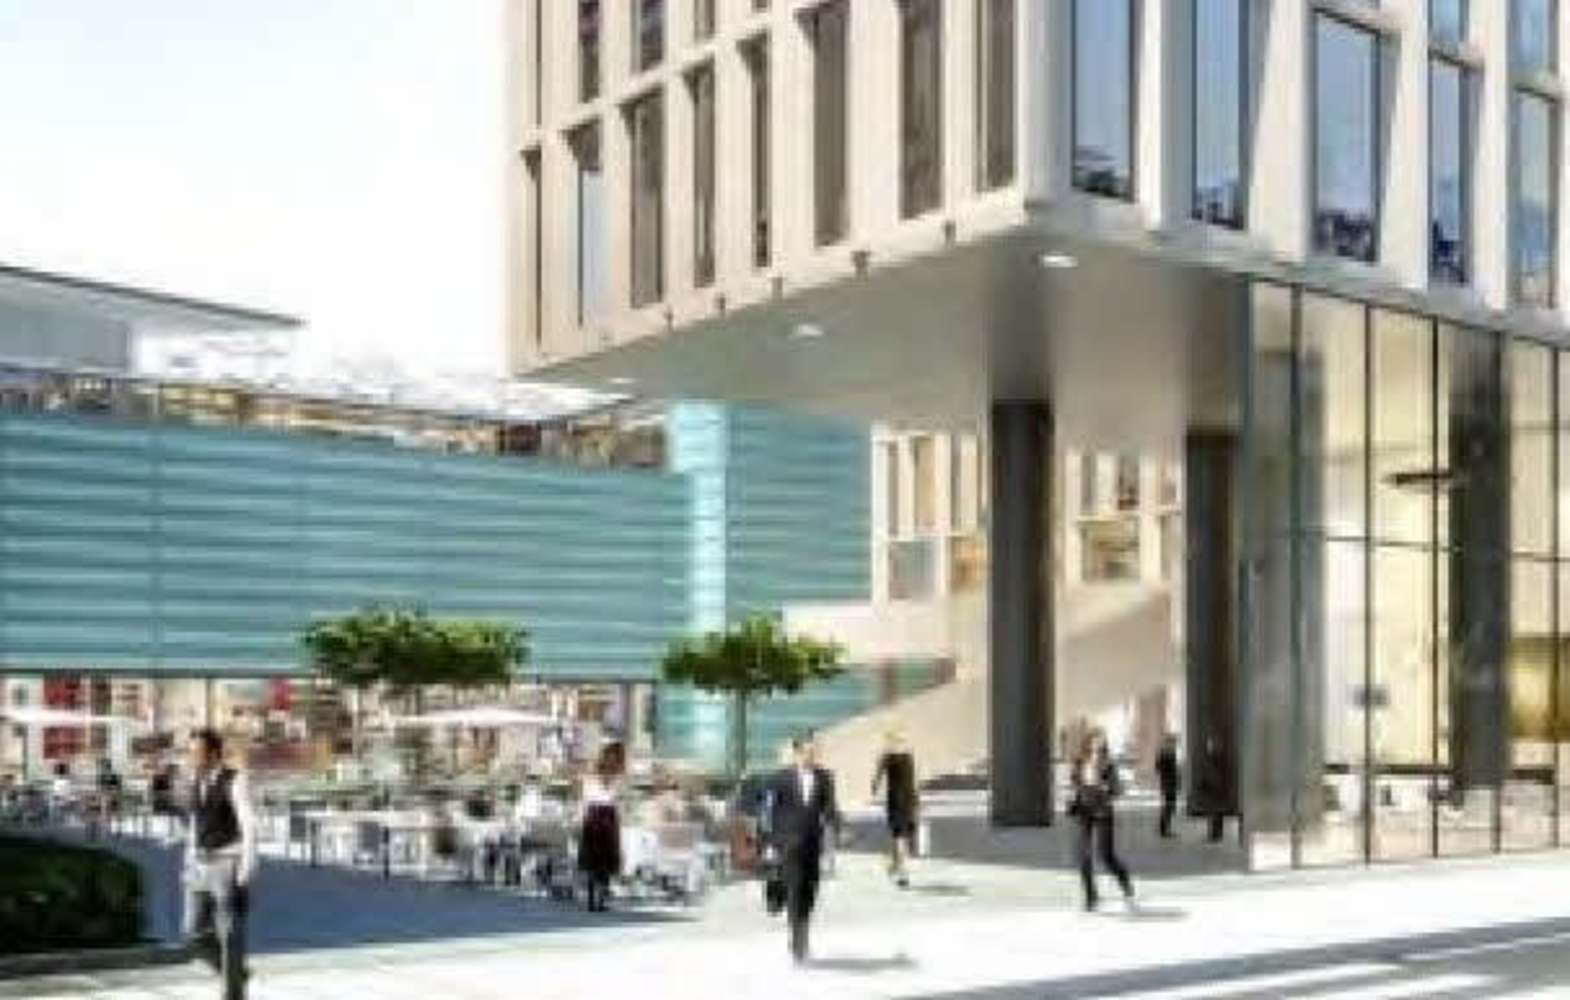 Büros Frankfurt am main, 60549 - Büro - Frankfurt am Main, Flughafen - F2653 - 10422001